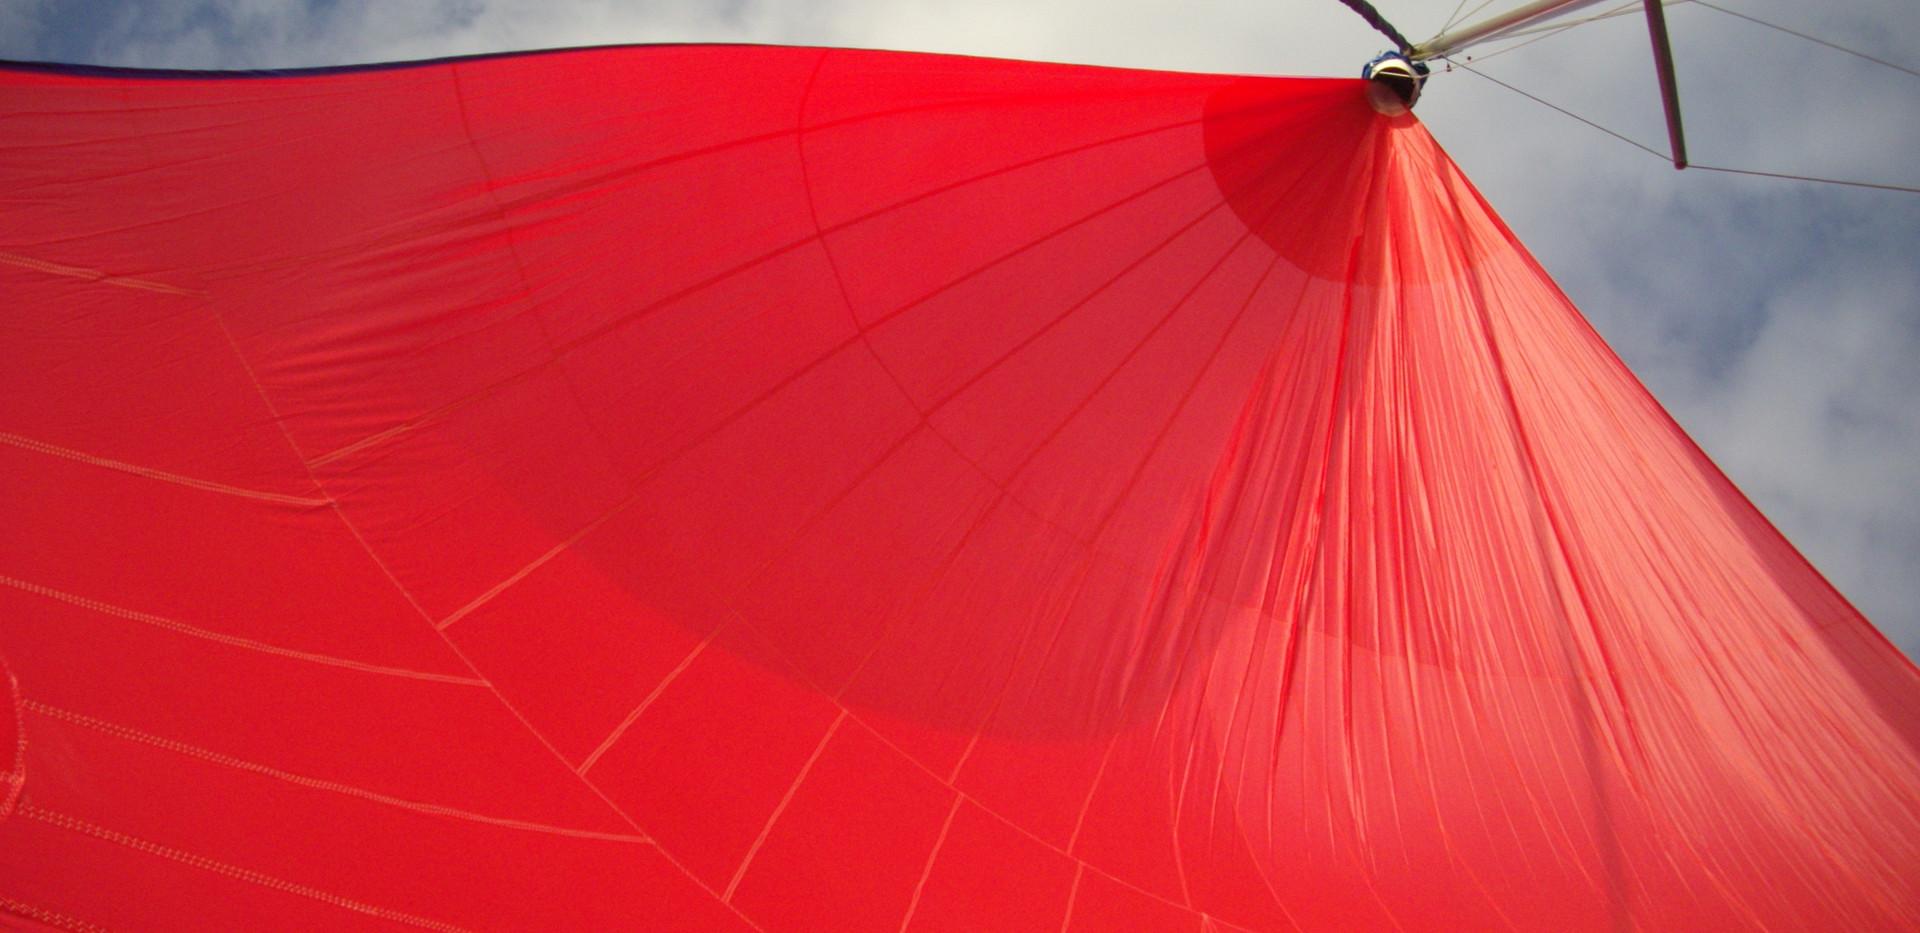 asymmetrical red.JPG